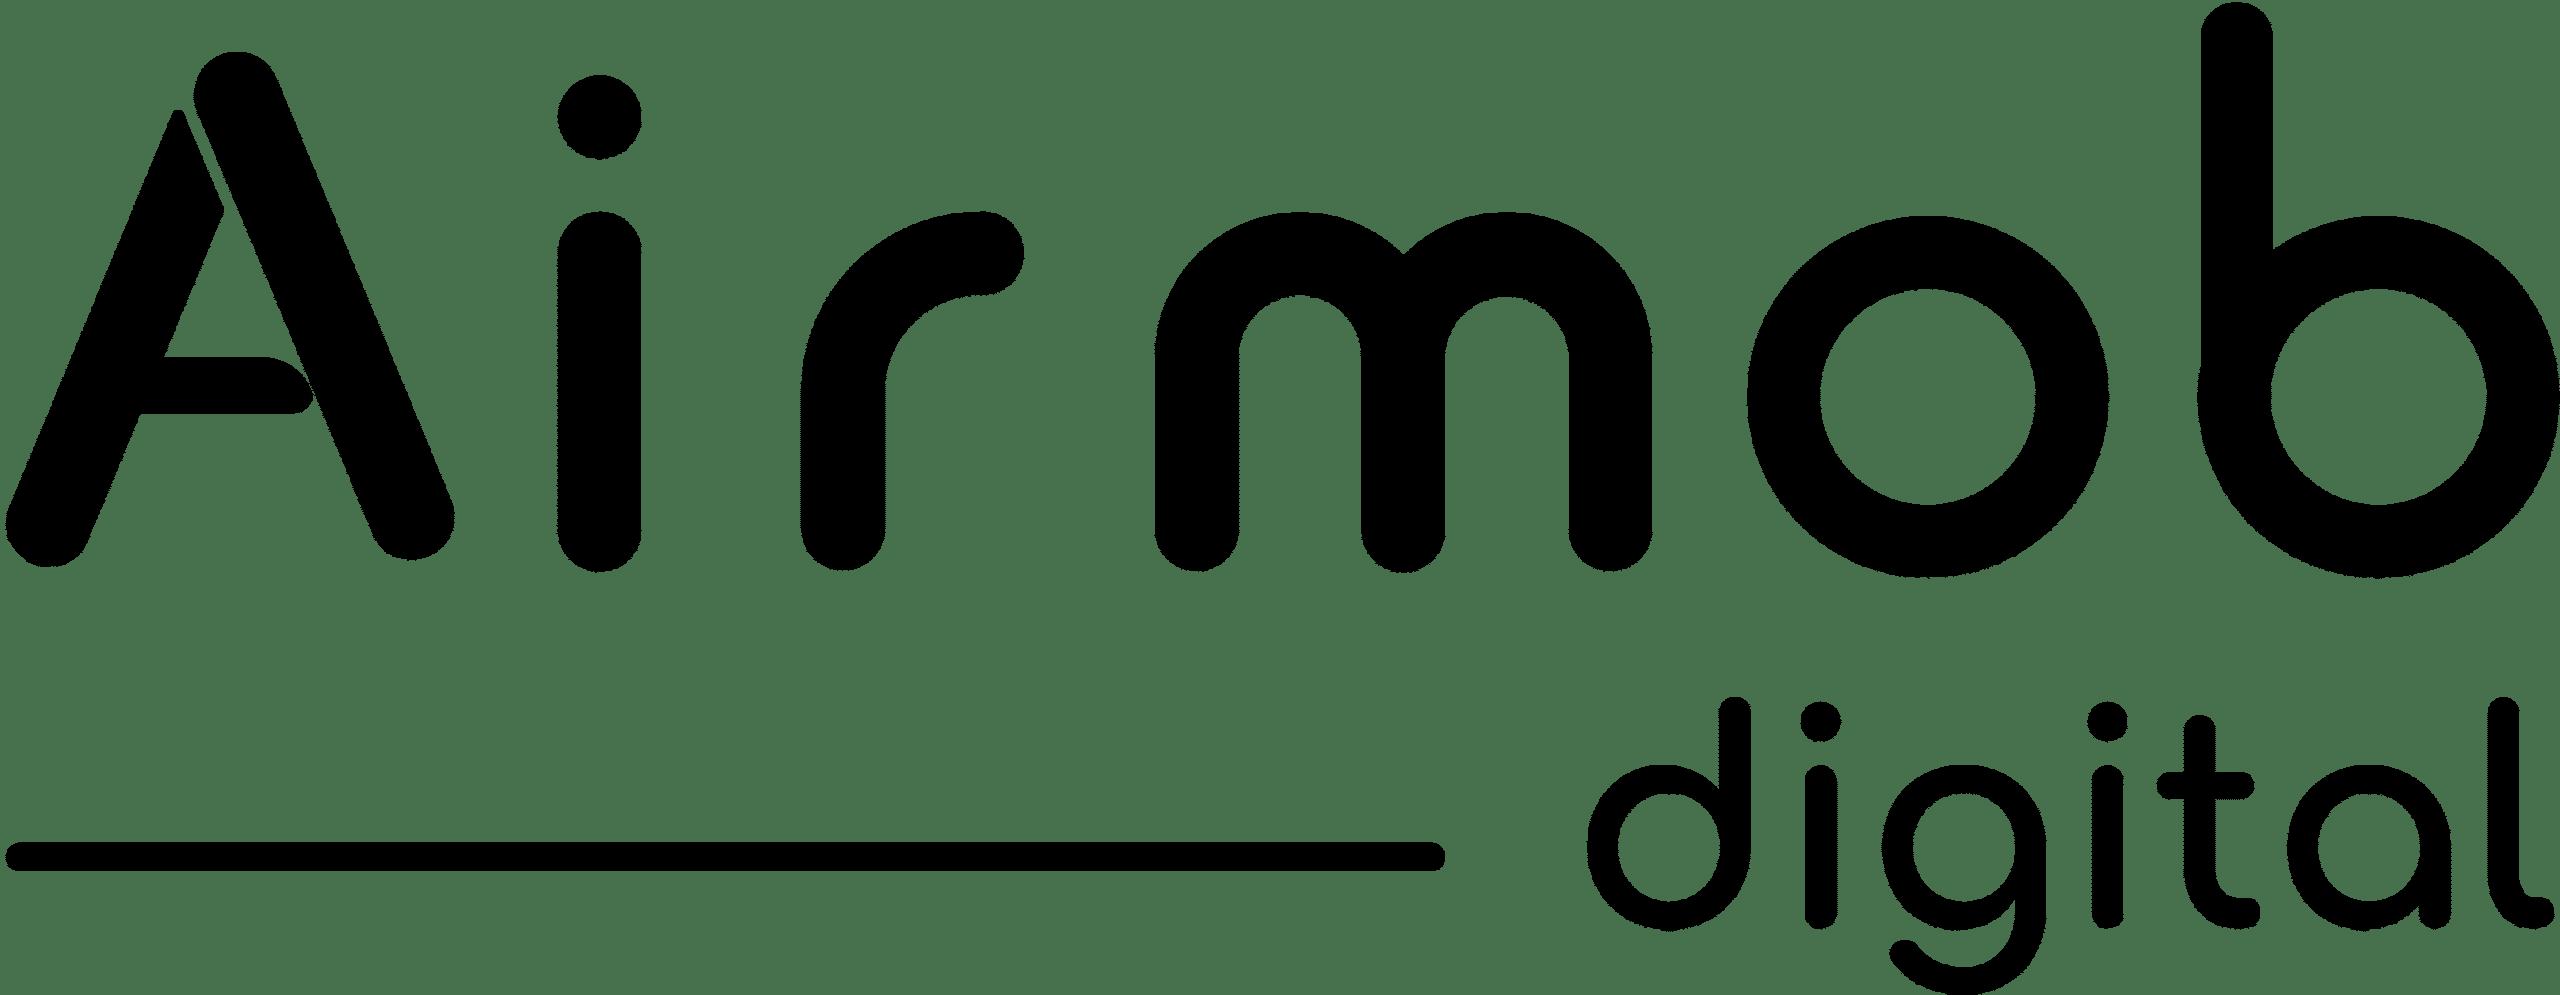 logo Airmob Digital